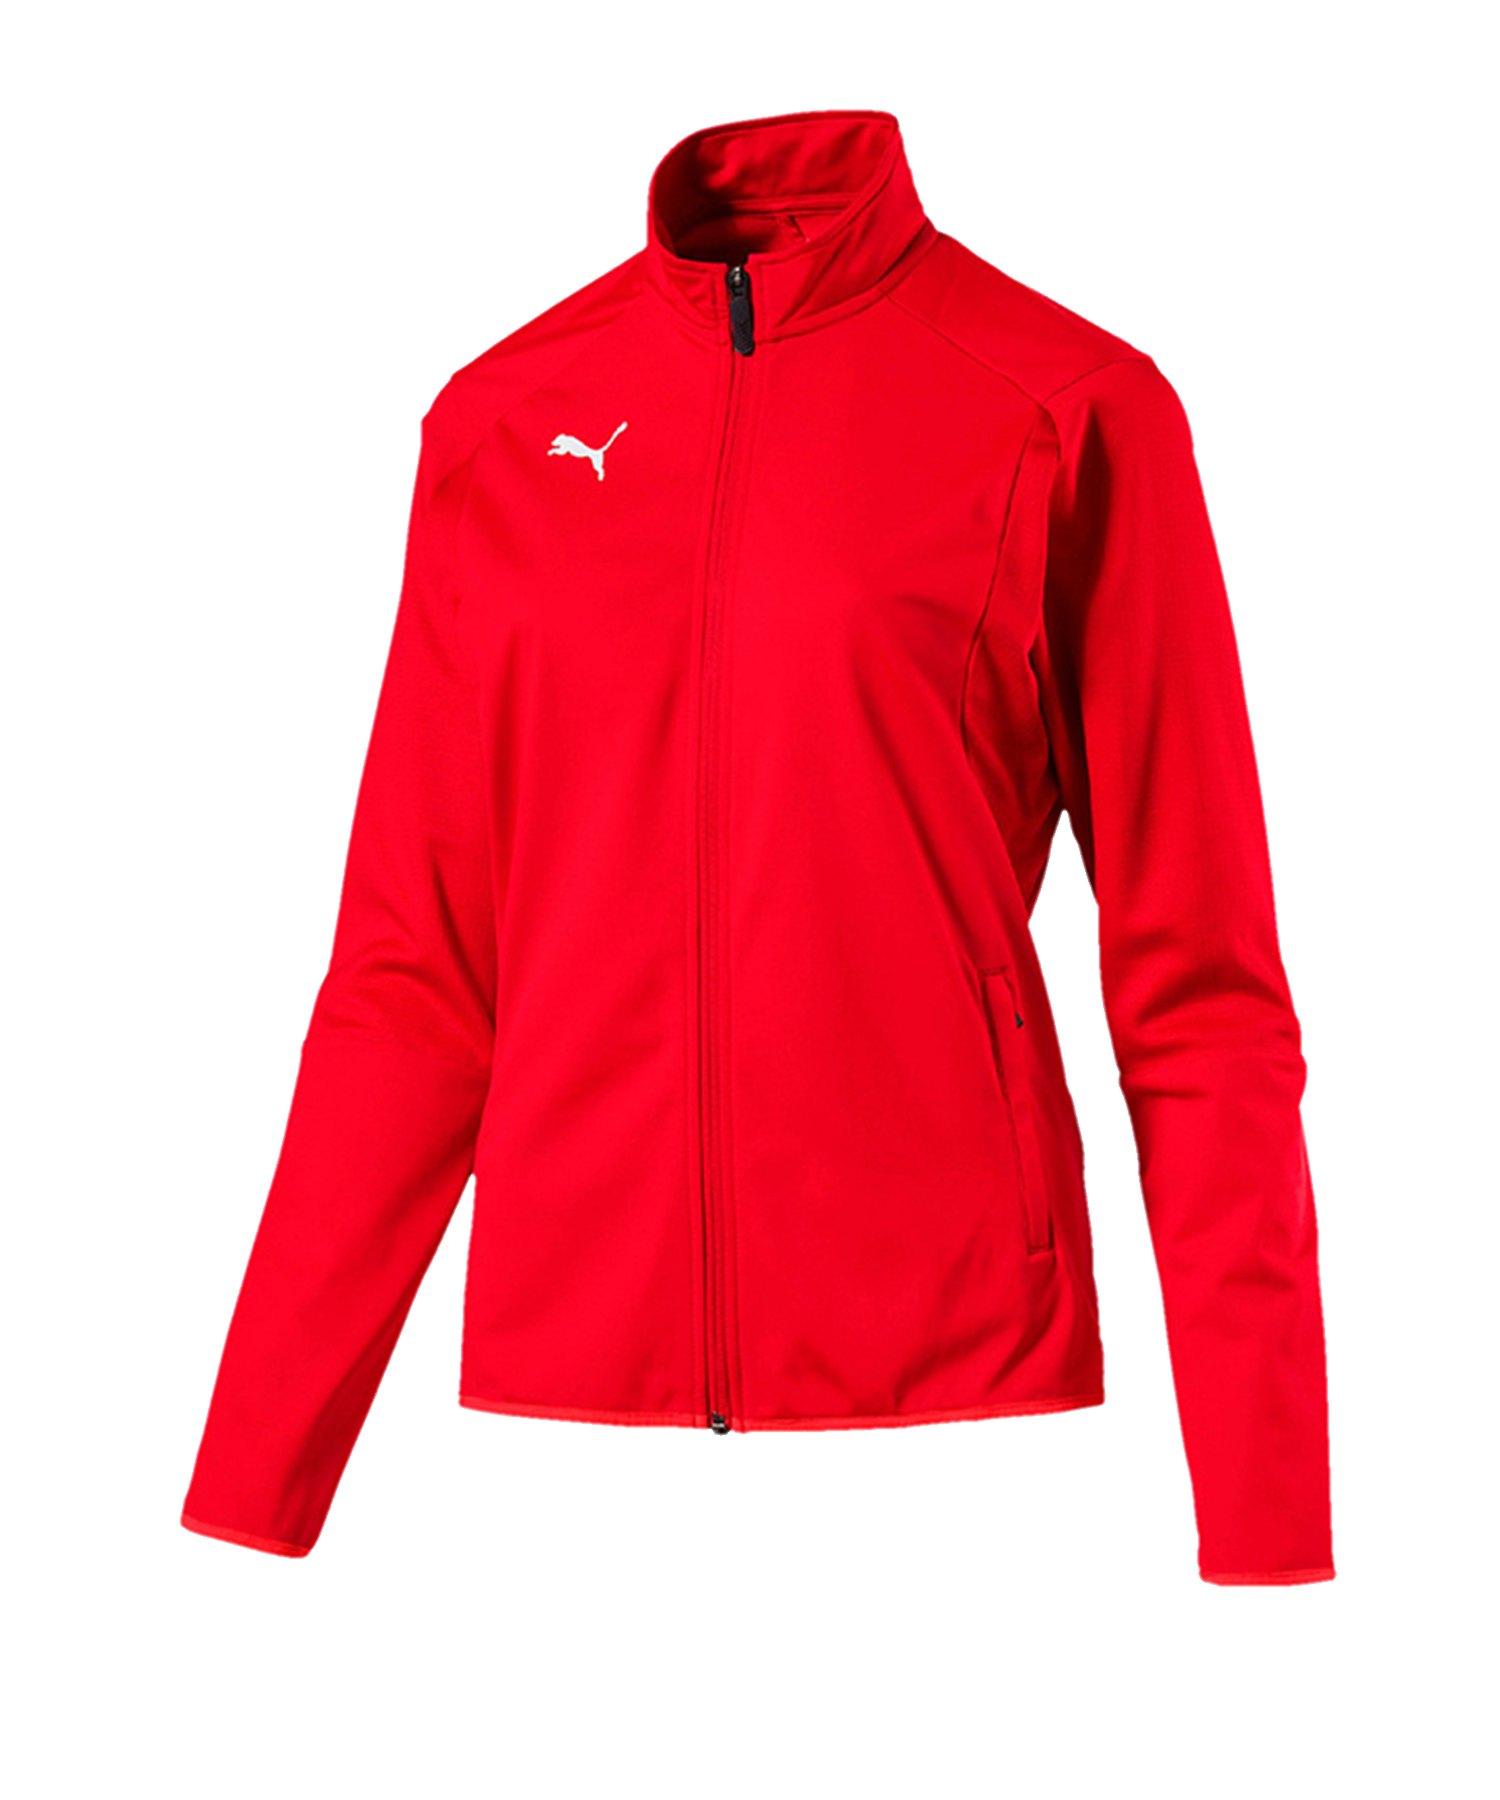 PUMA LIGA Trainingsjacke Damen Rot F01 - rot